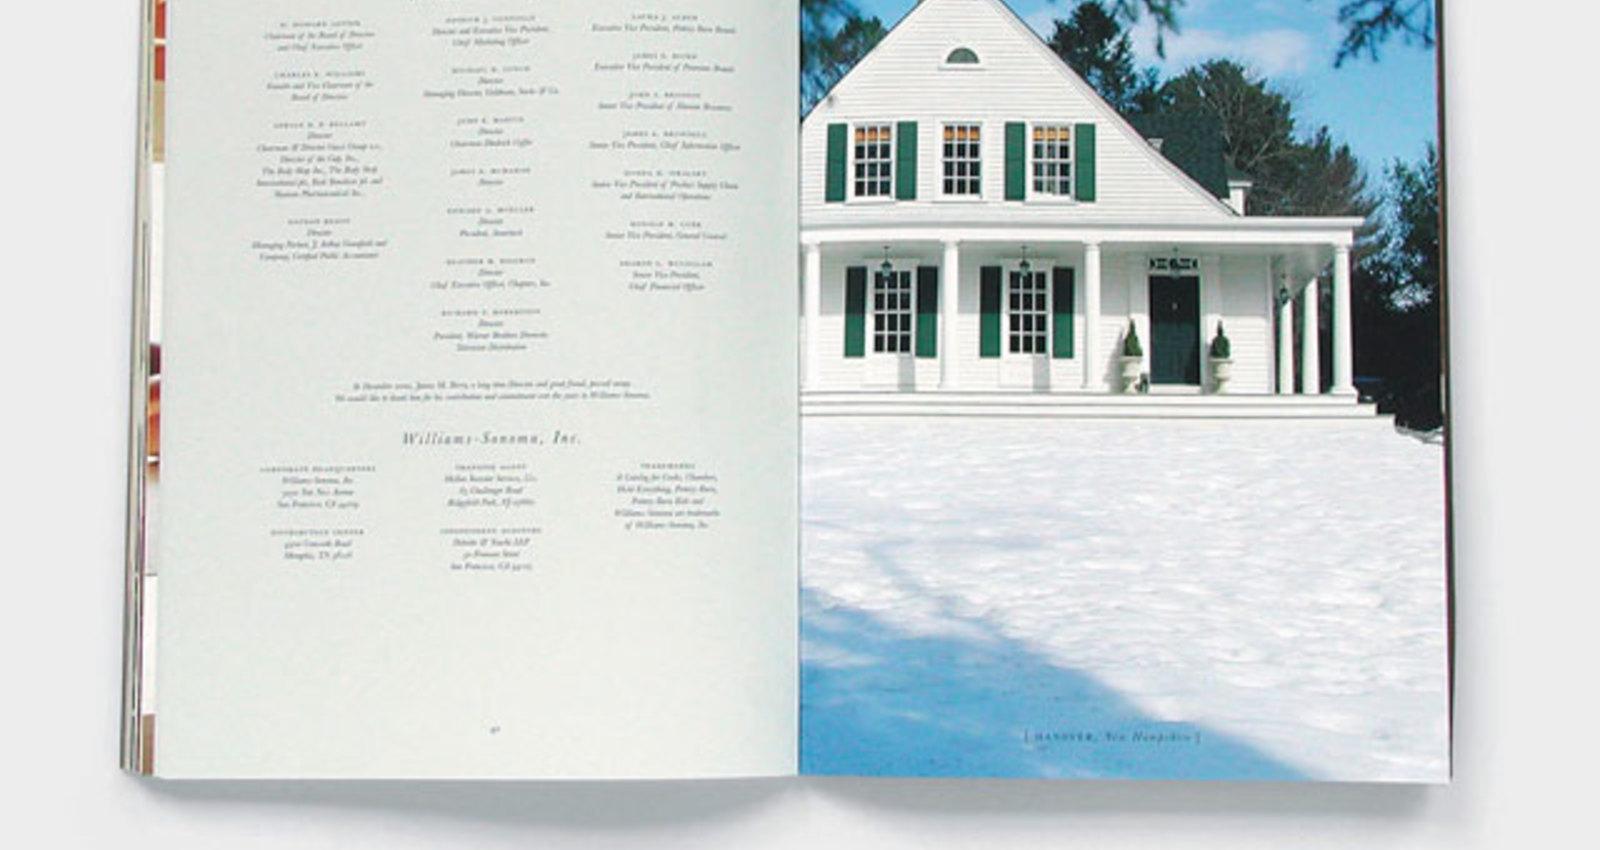 2000 Annual Report